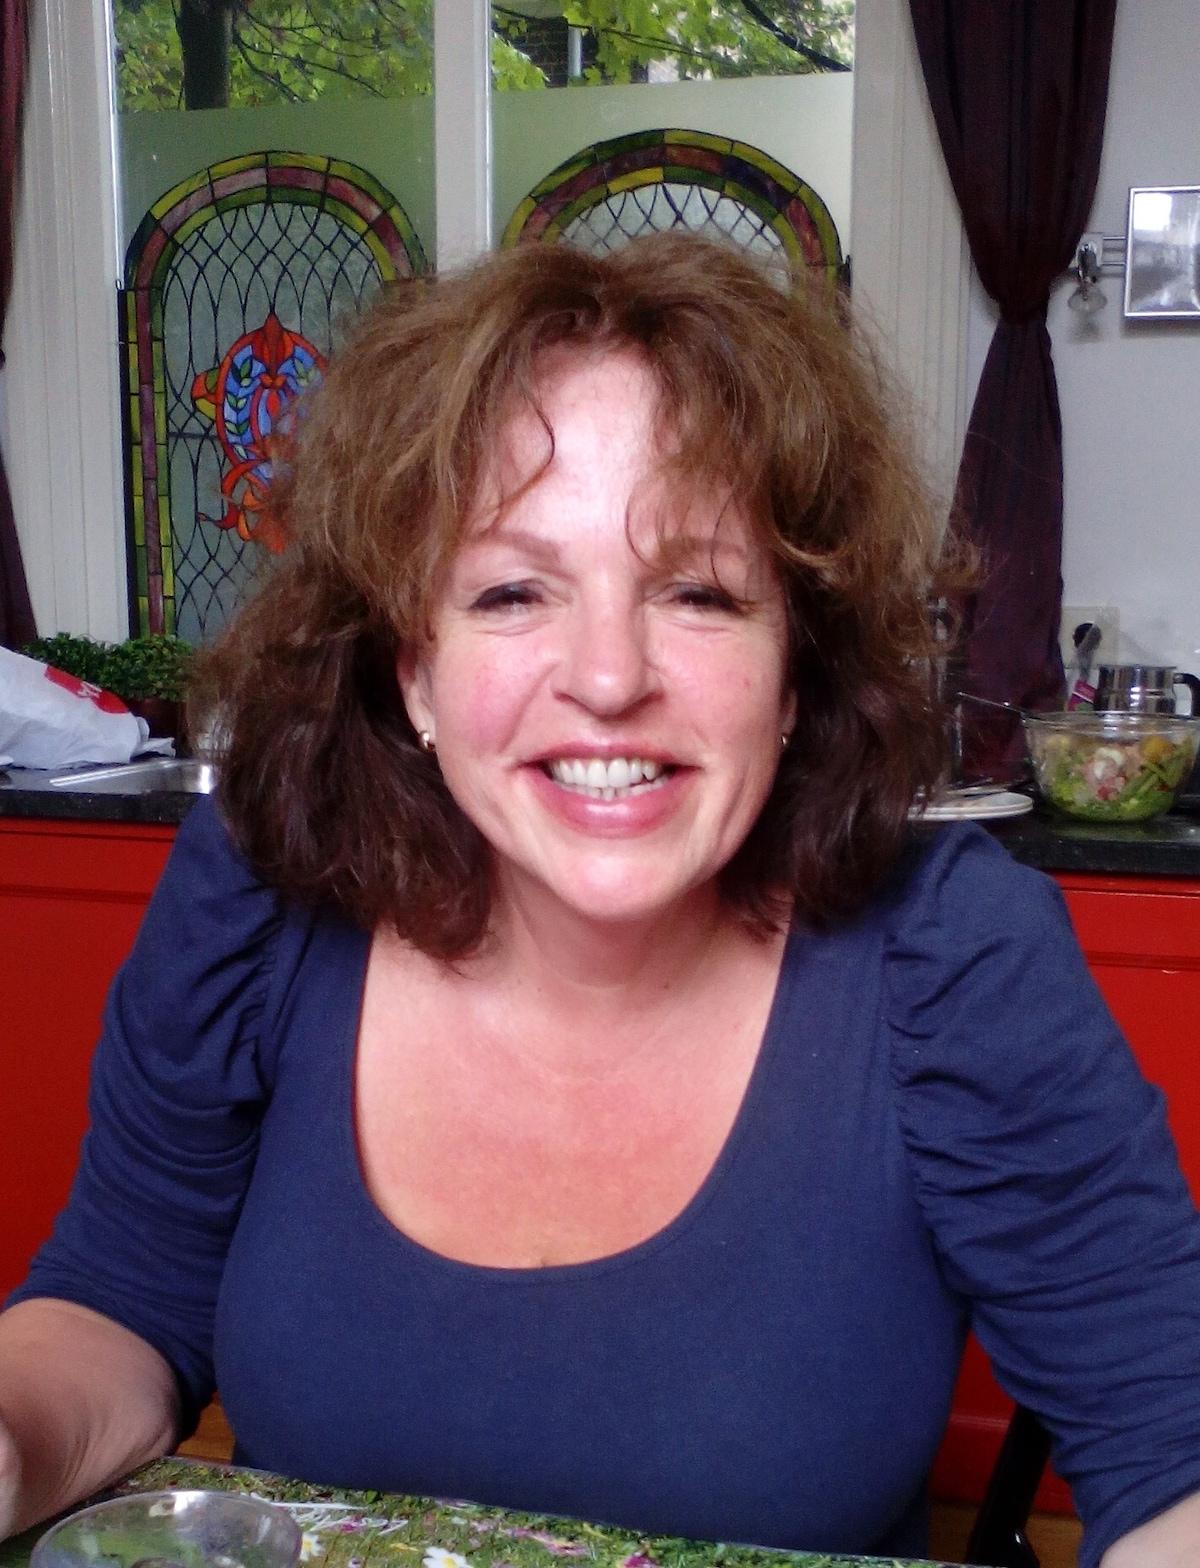 Marieke From Velp, Netherlands